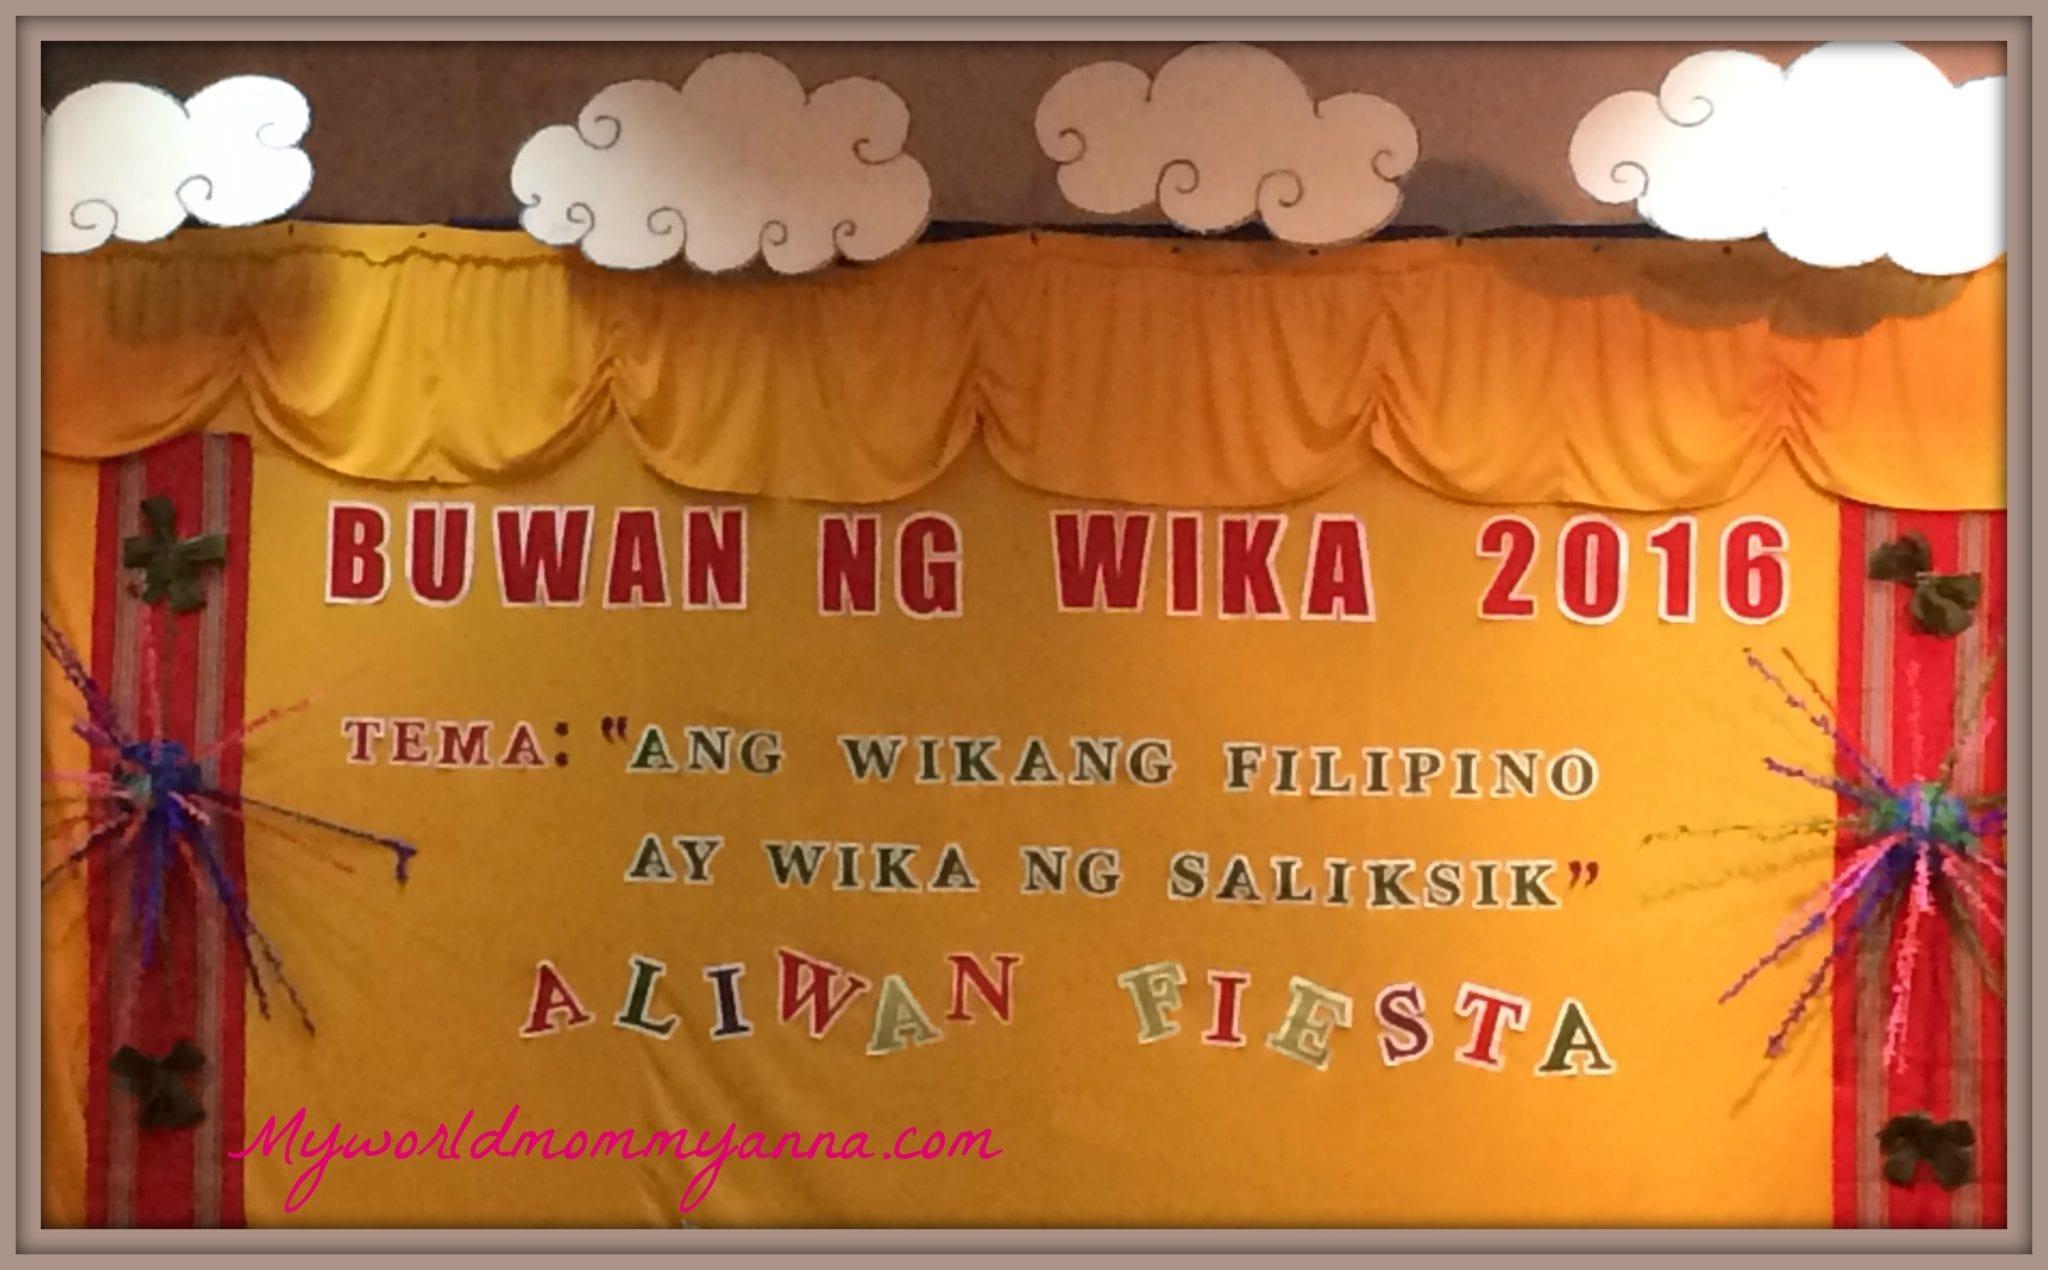 Little Kulit Buwan ng Wika - My World Mommy Anna